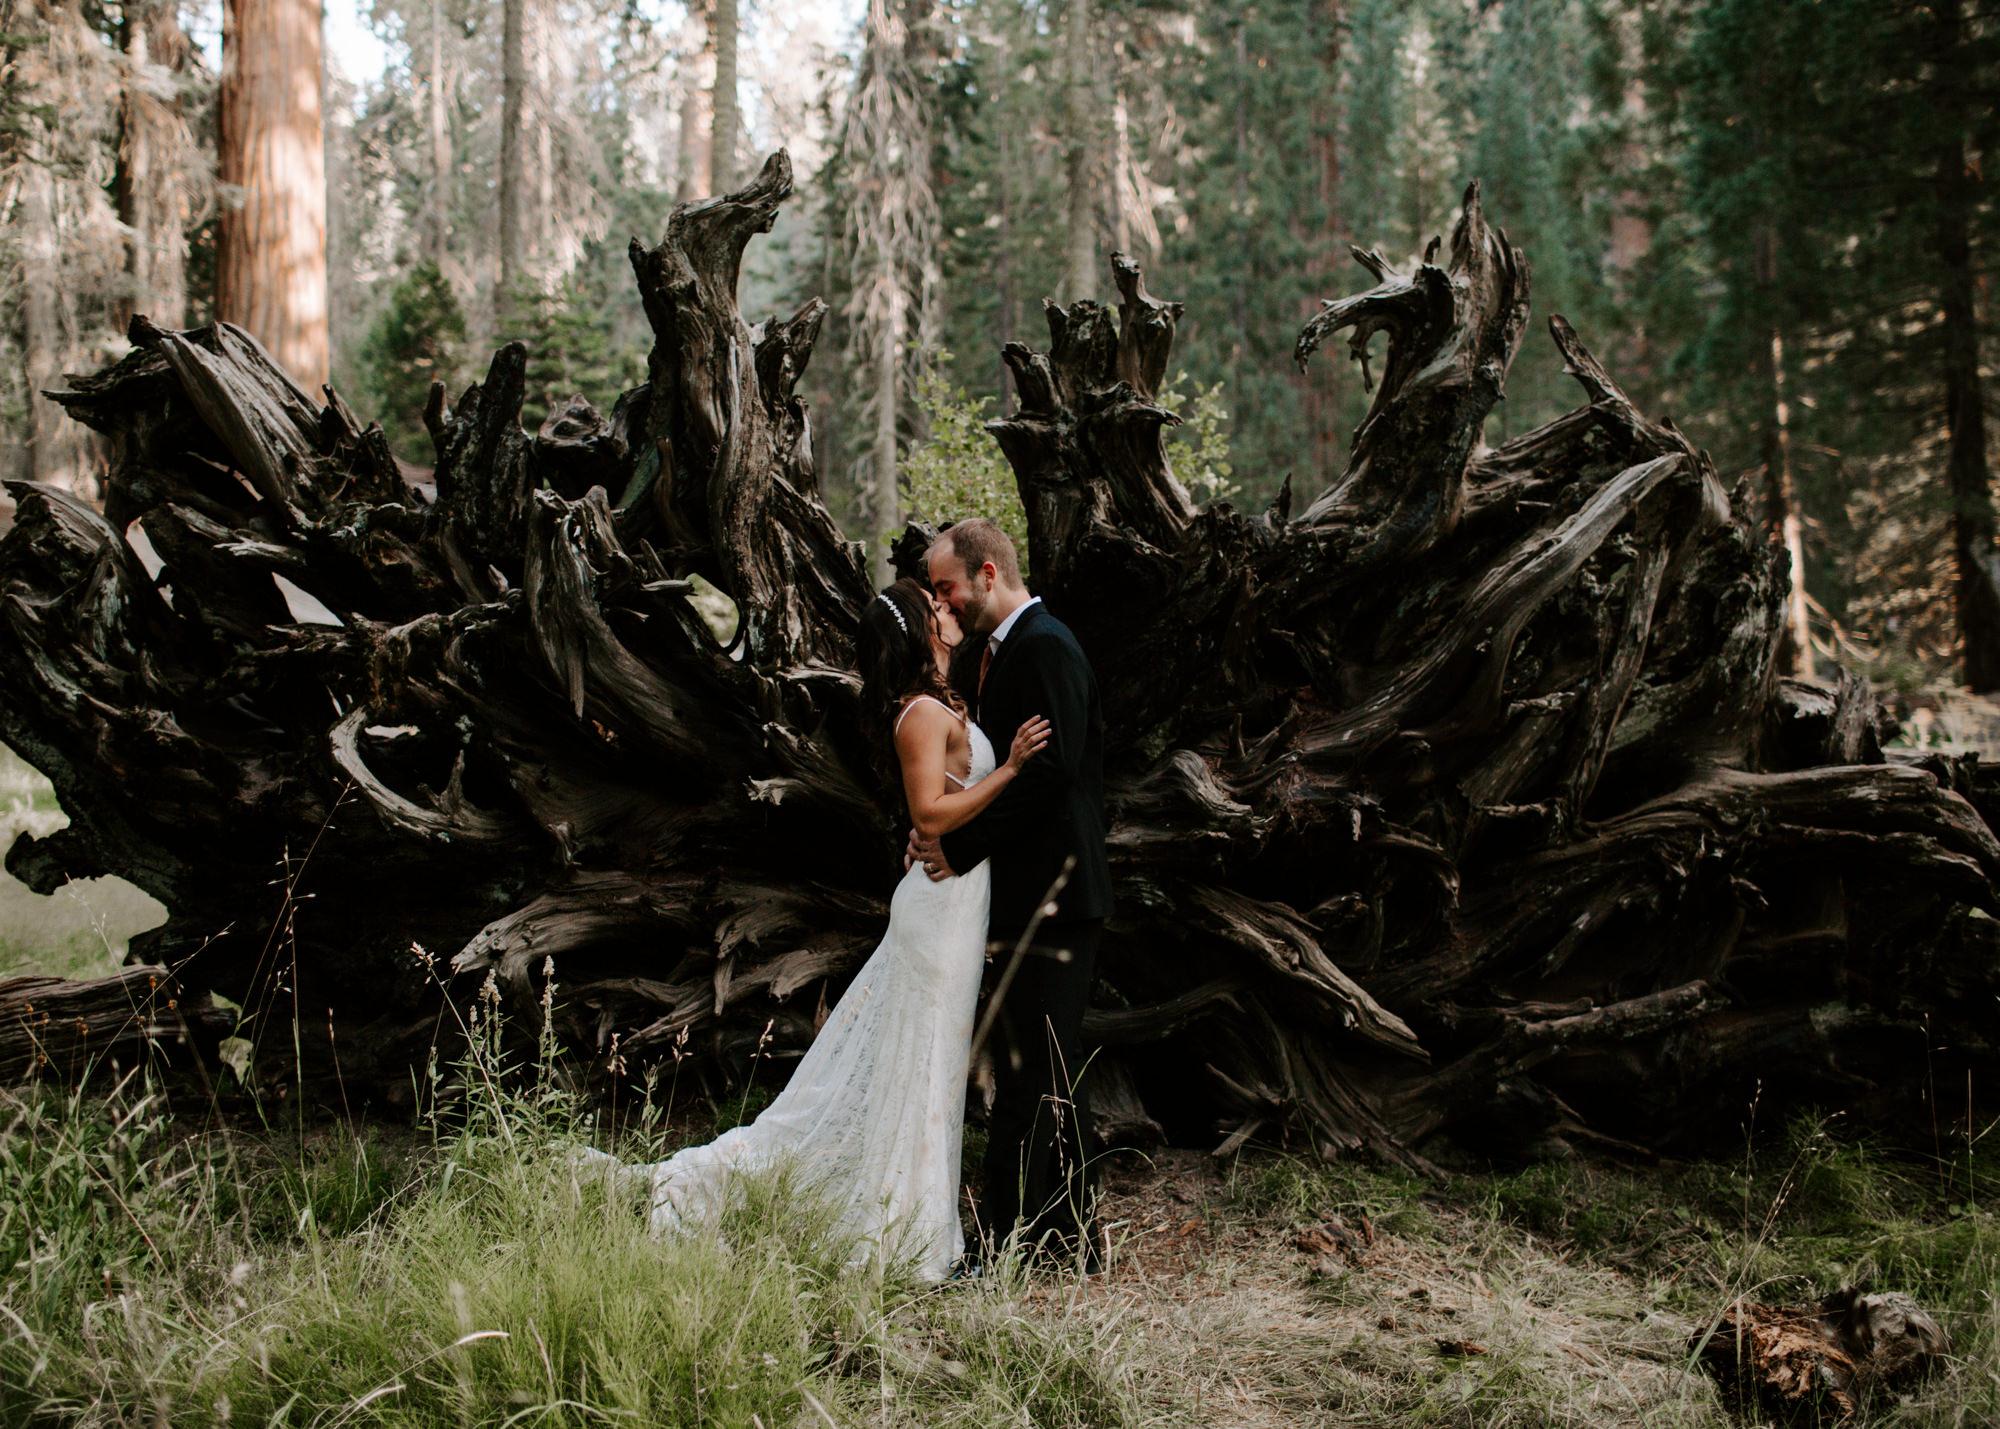 sequoia national park elopement-26.jpg